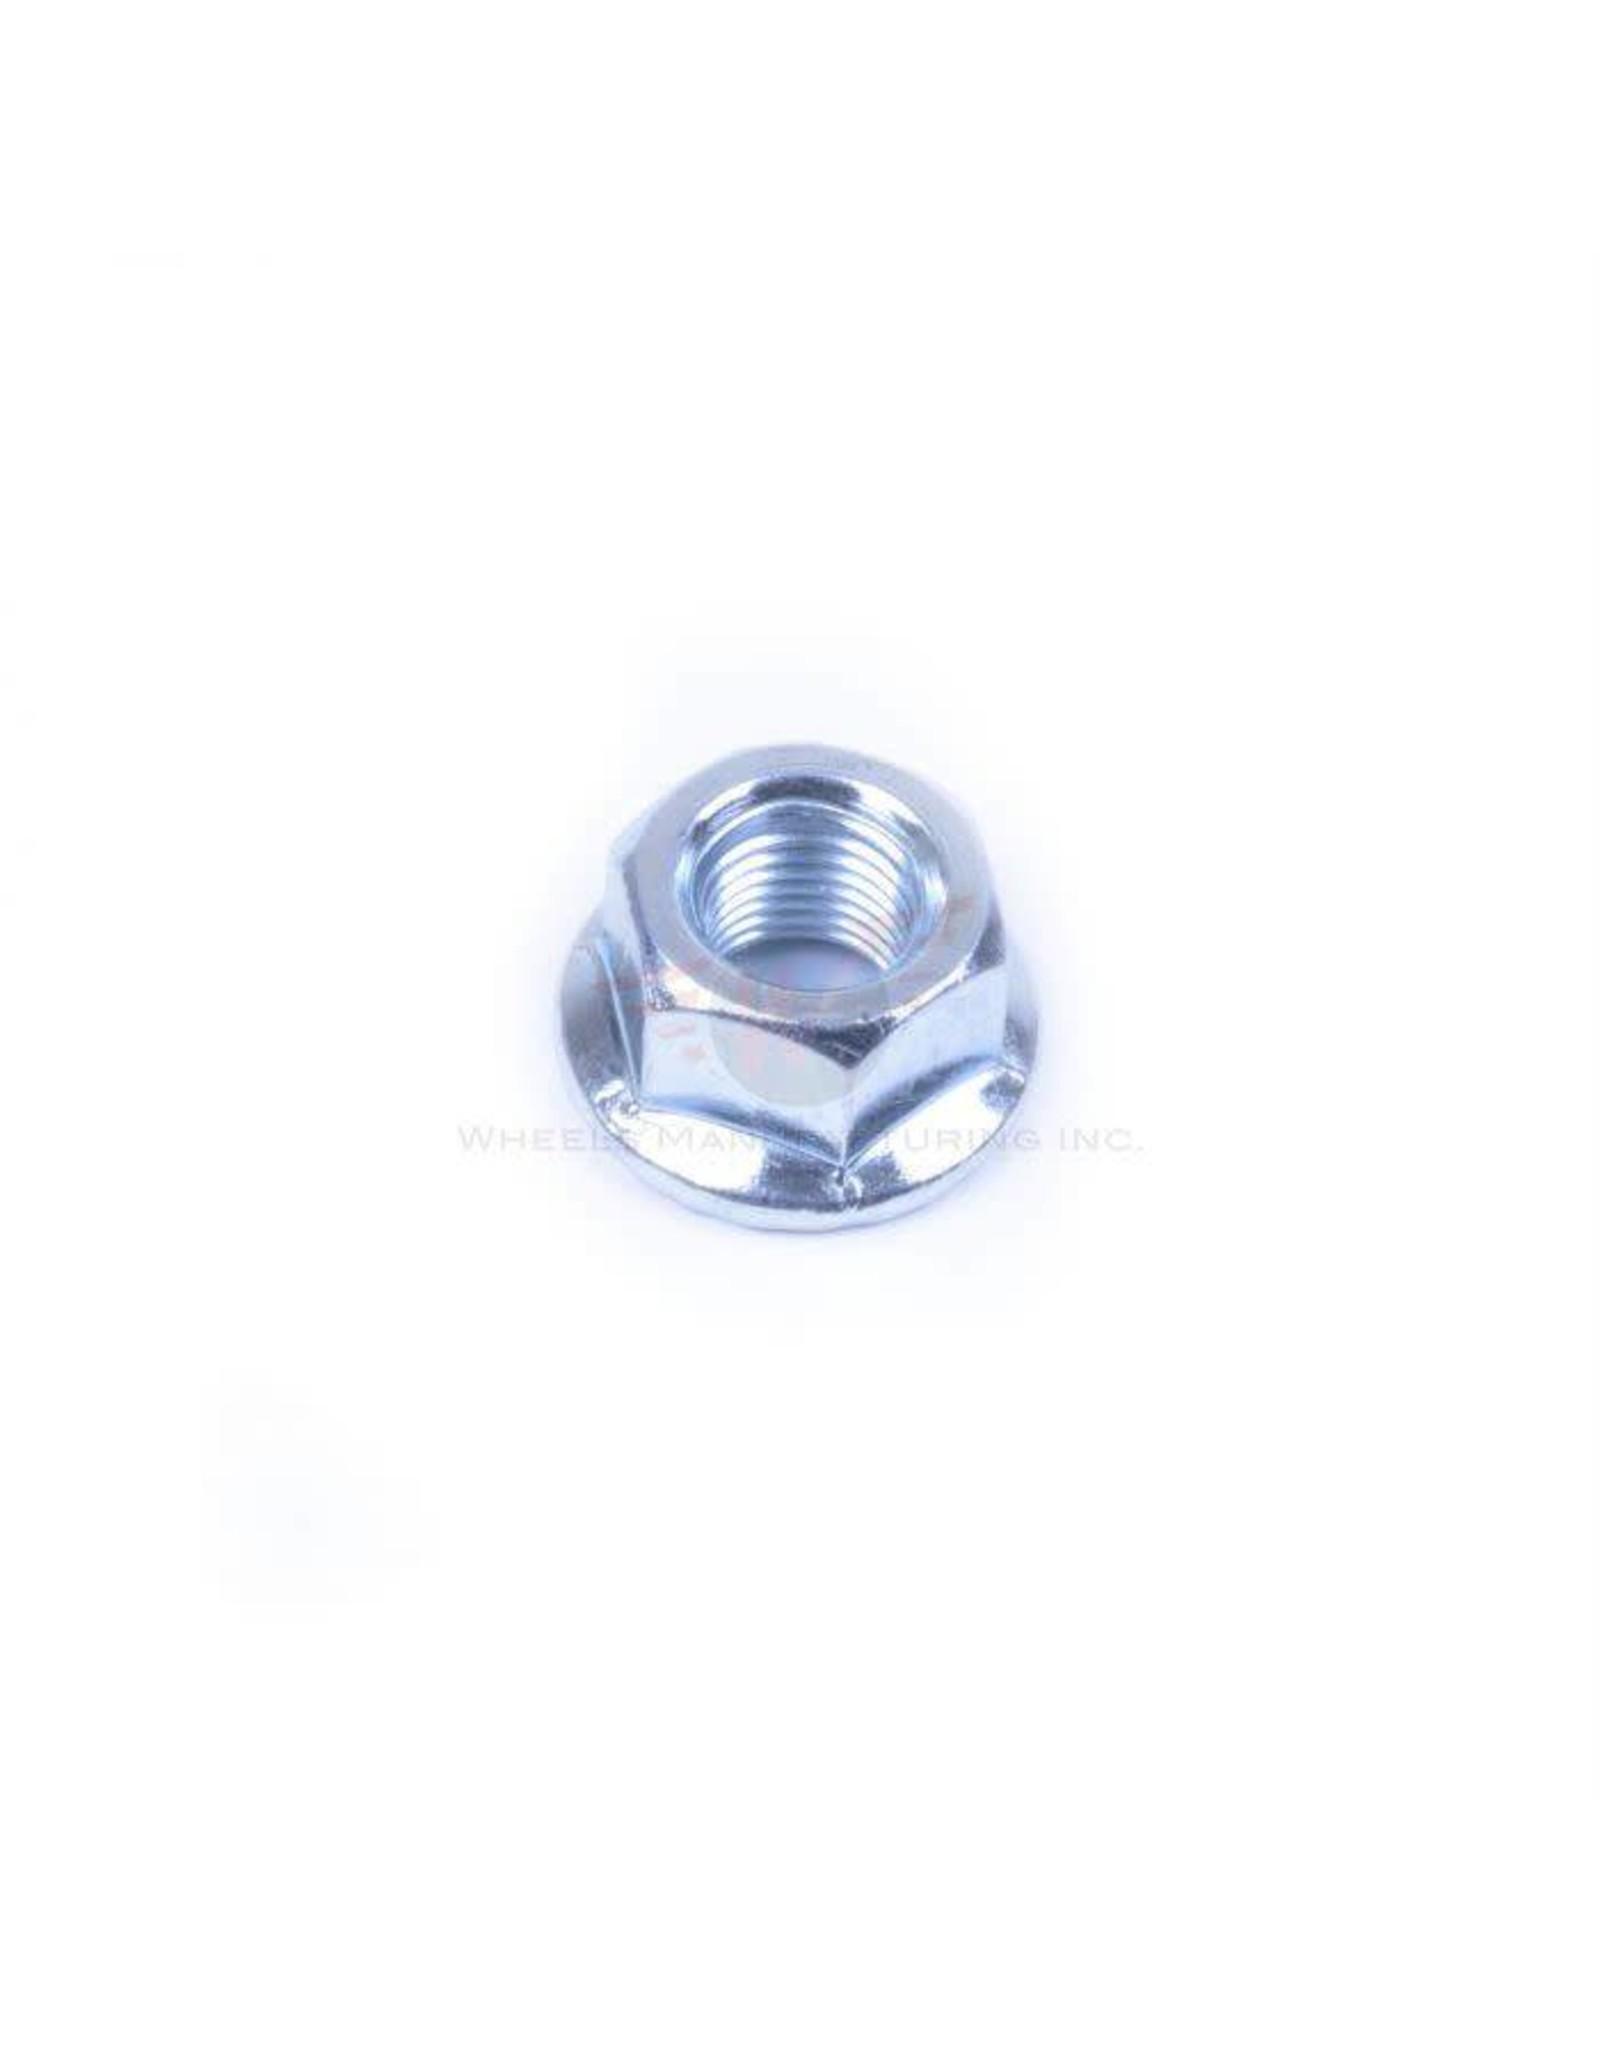 WHEELS MANUFACTURING Wheels Manufacturing Axle Nut M9x1